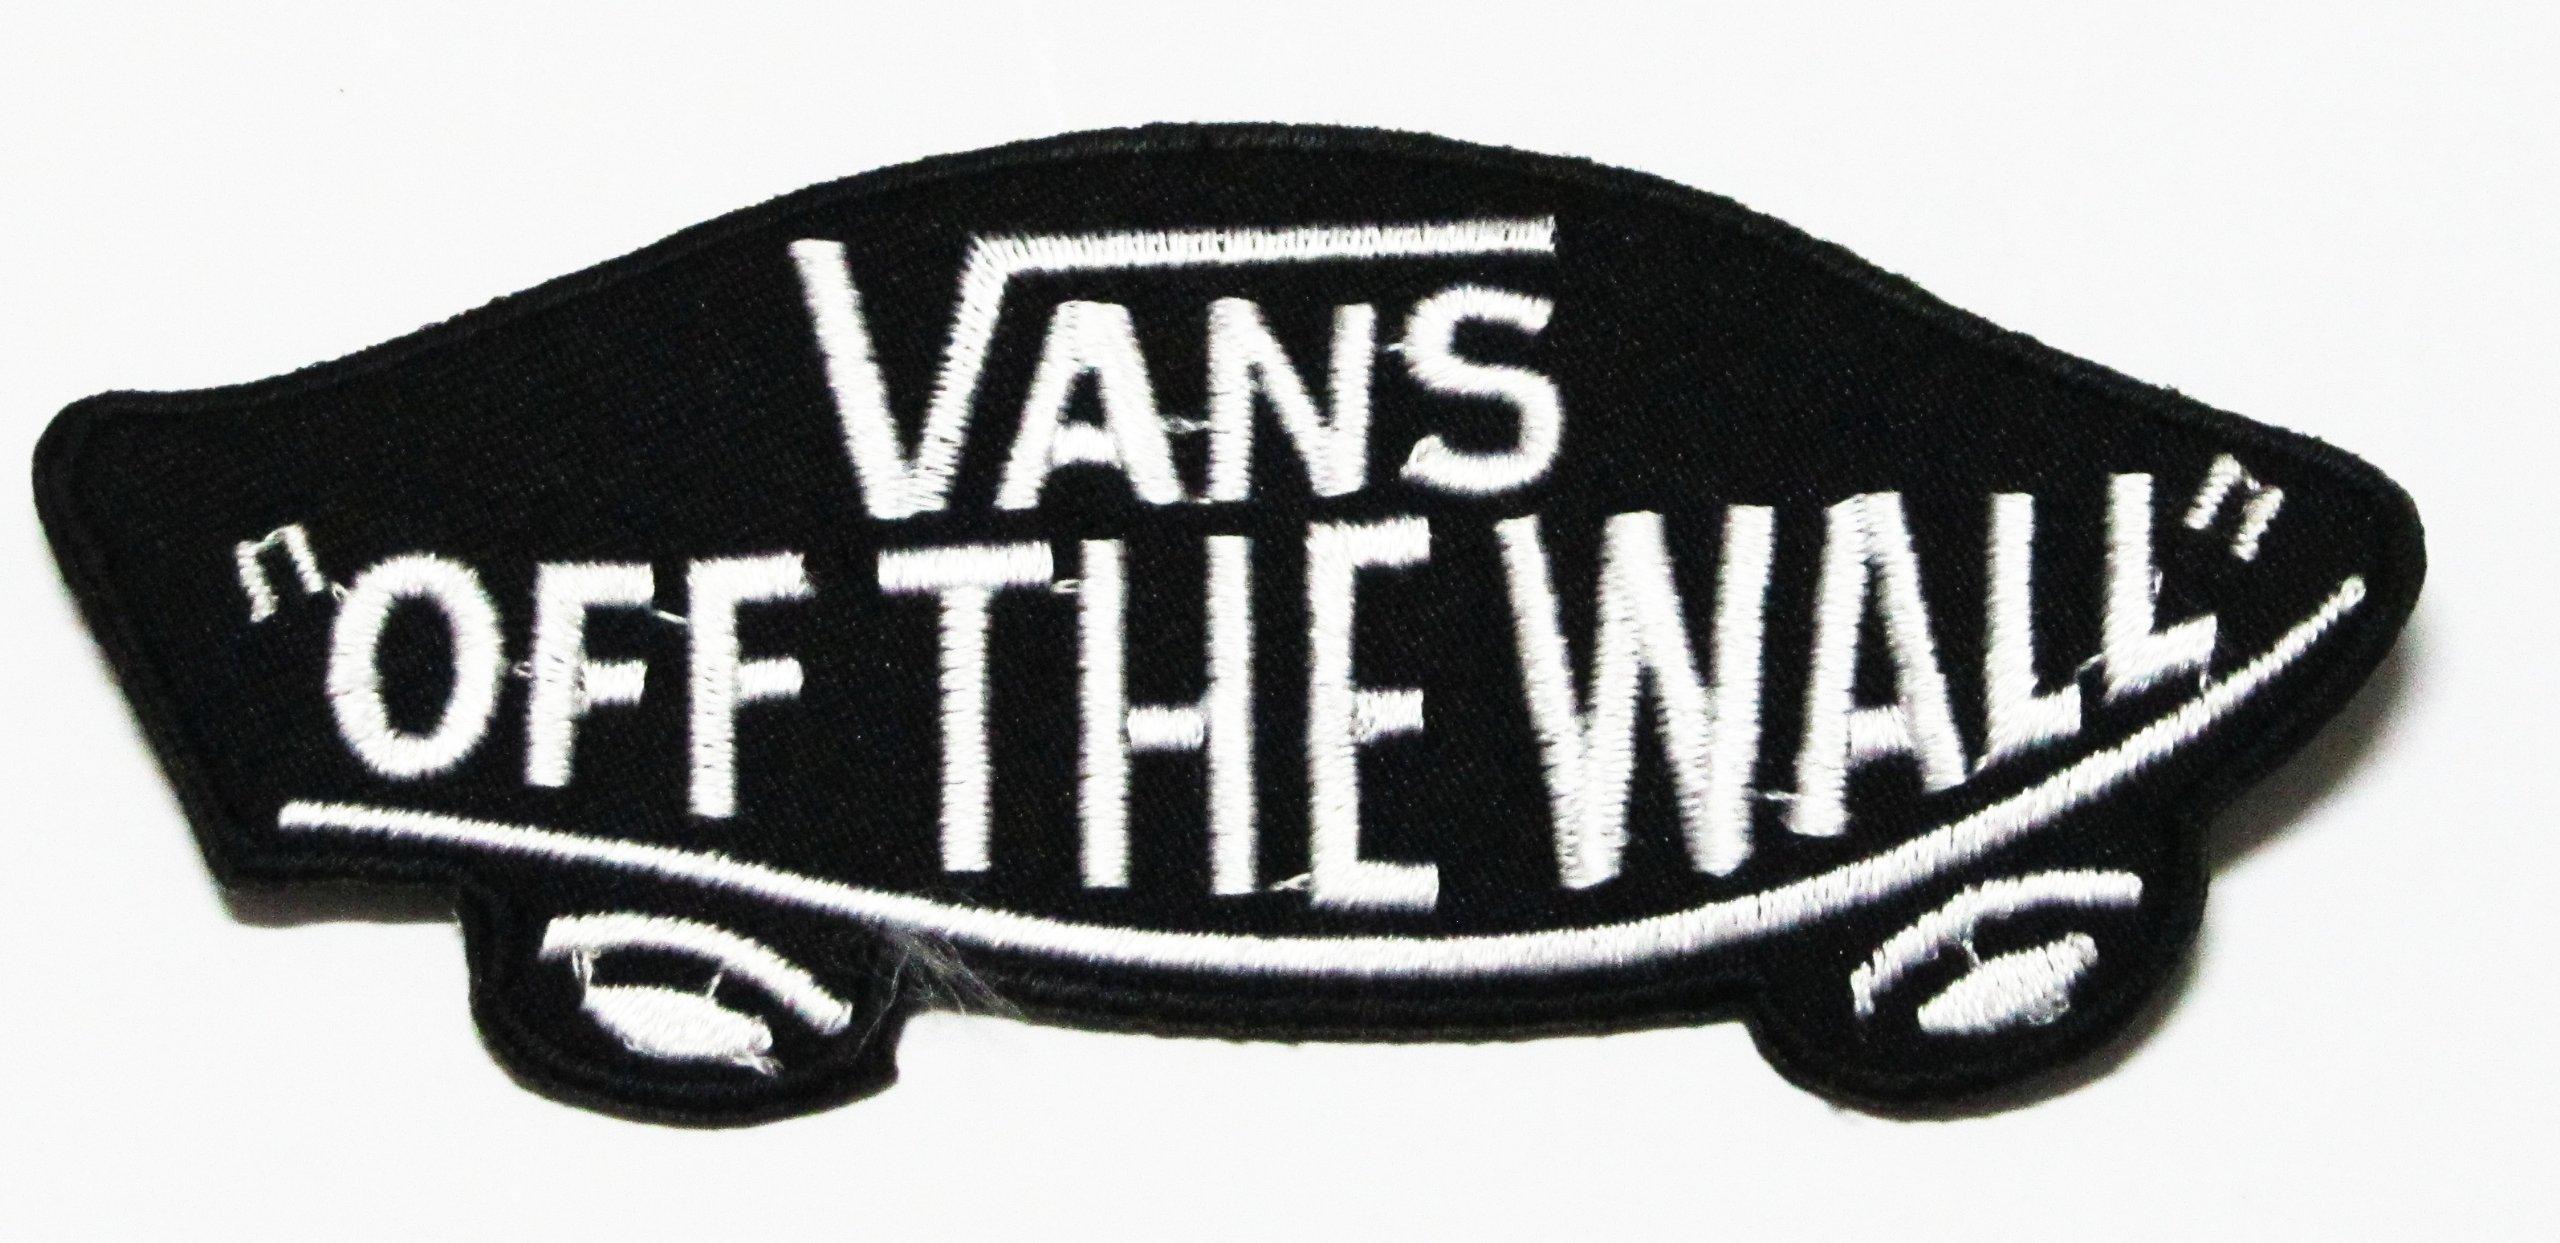 Amazon.com: Vans Off the Wall Skate Logo Black Colour Patches ...